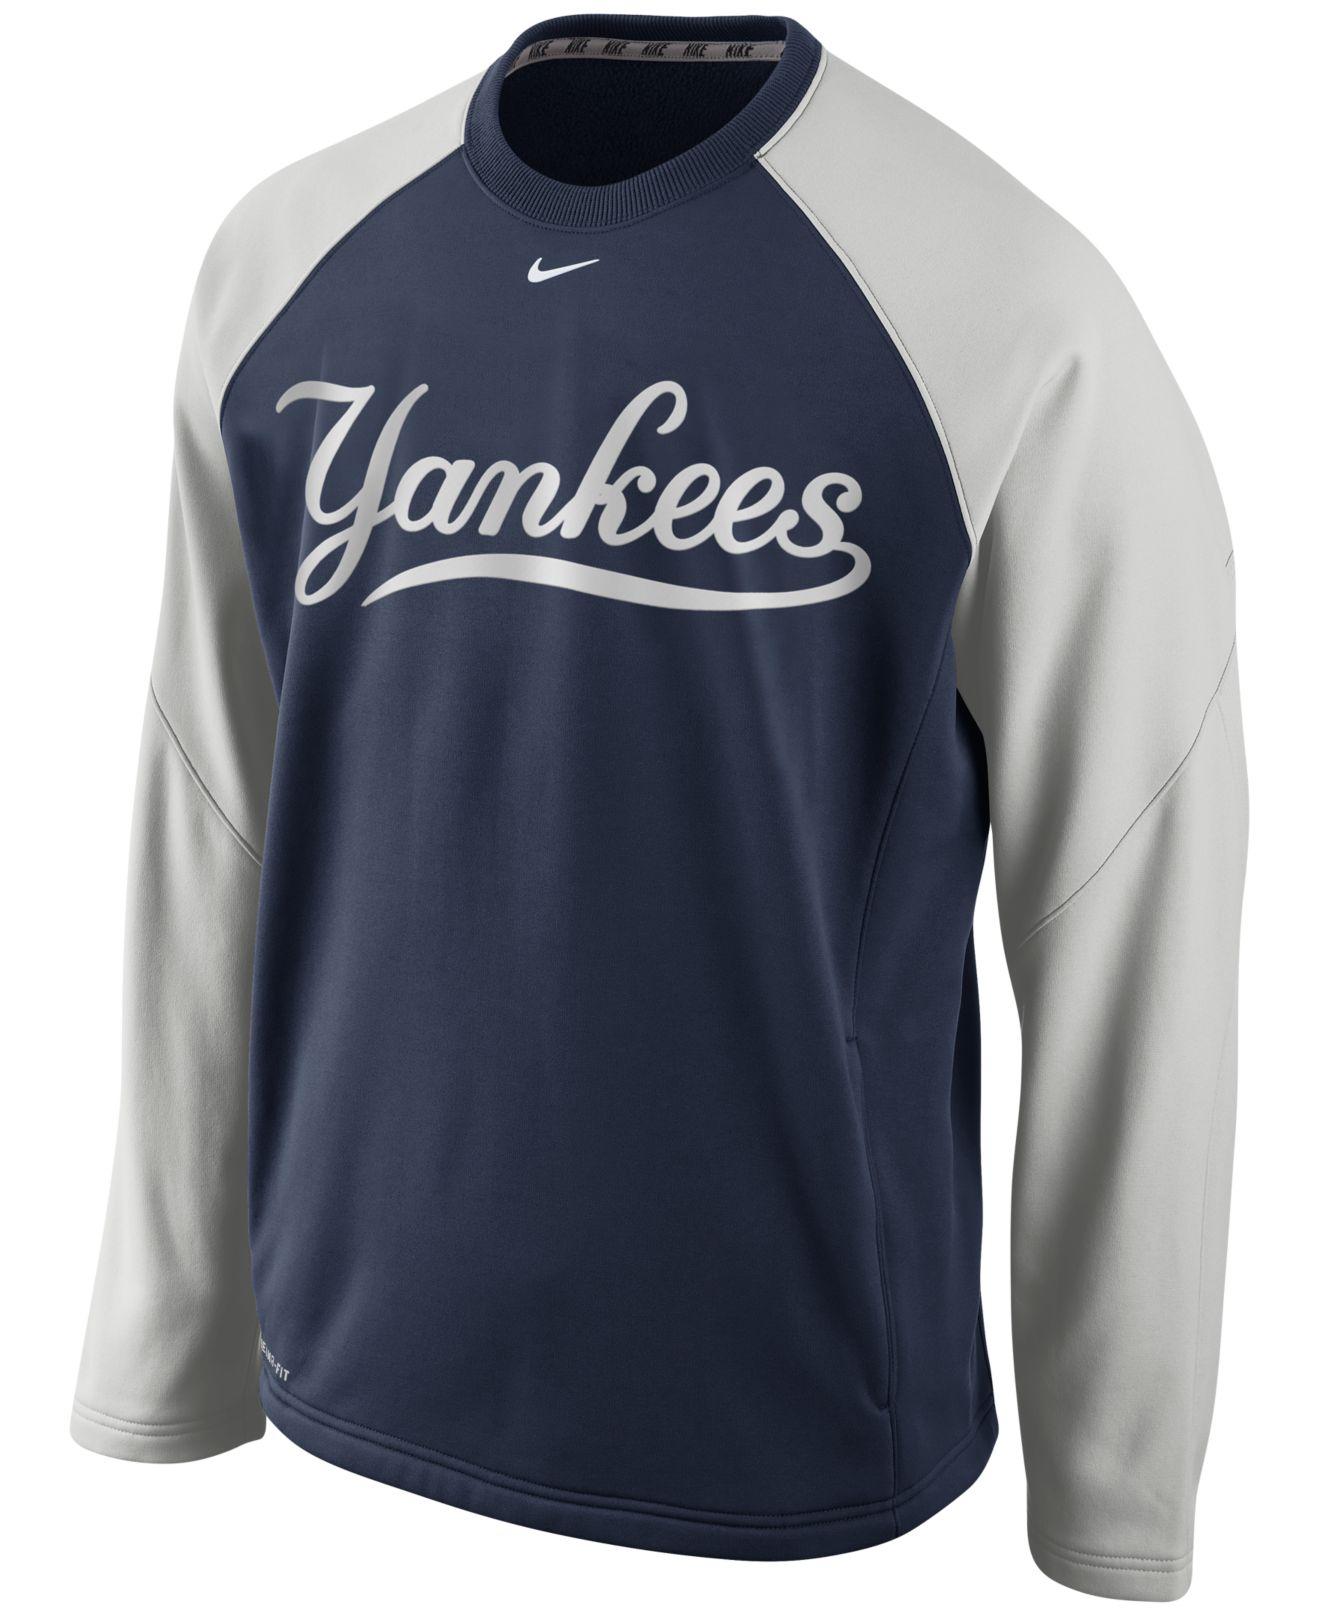 Nike Men's New York Yankees Therma-fit 1.4 Crew Sweatshirt in Blue ...